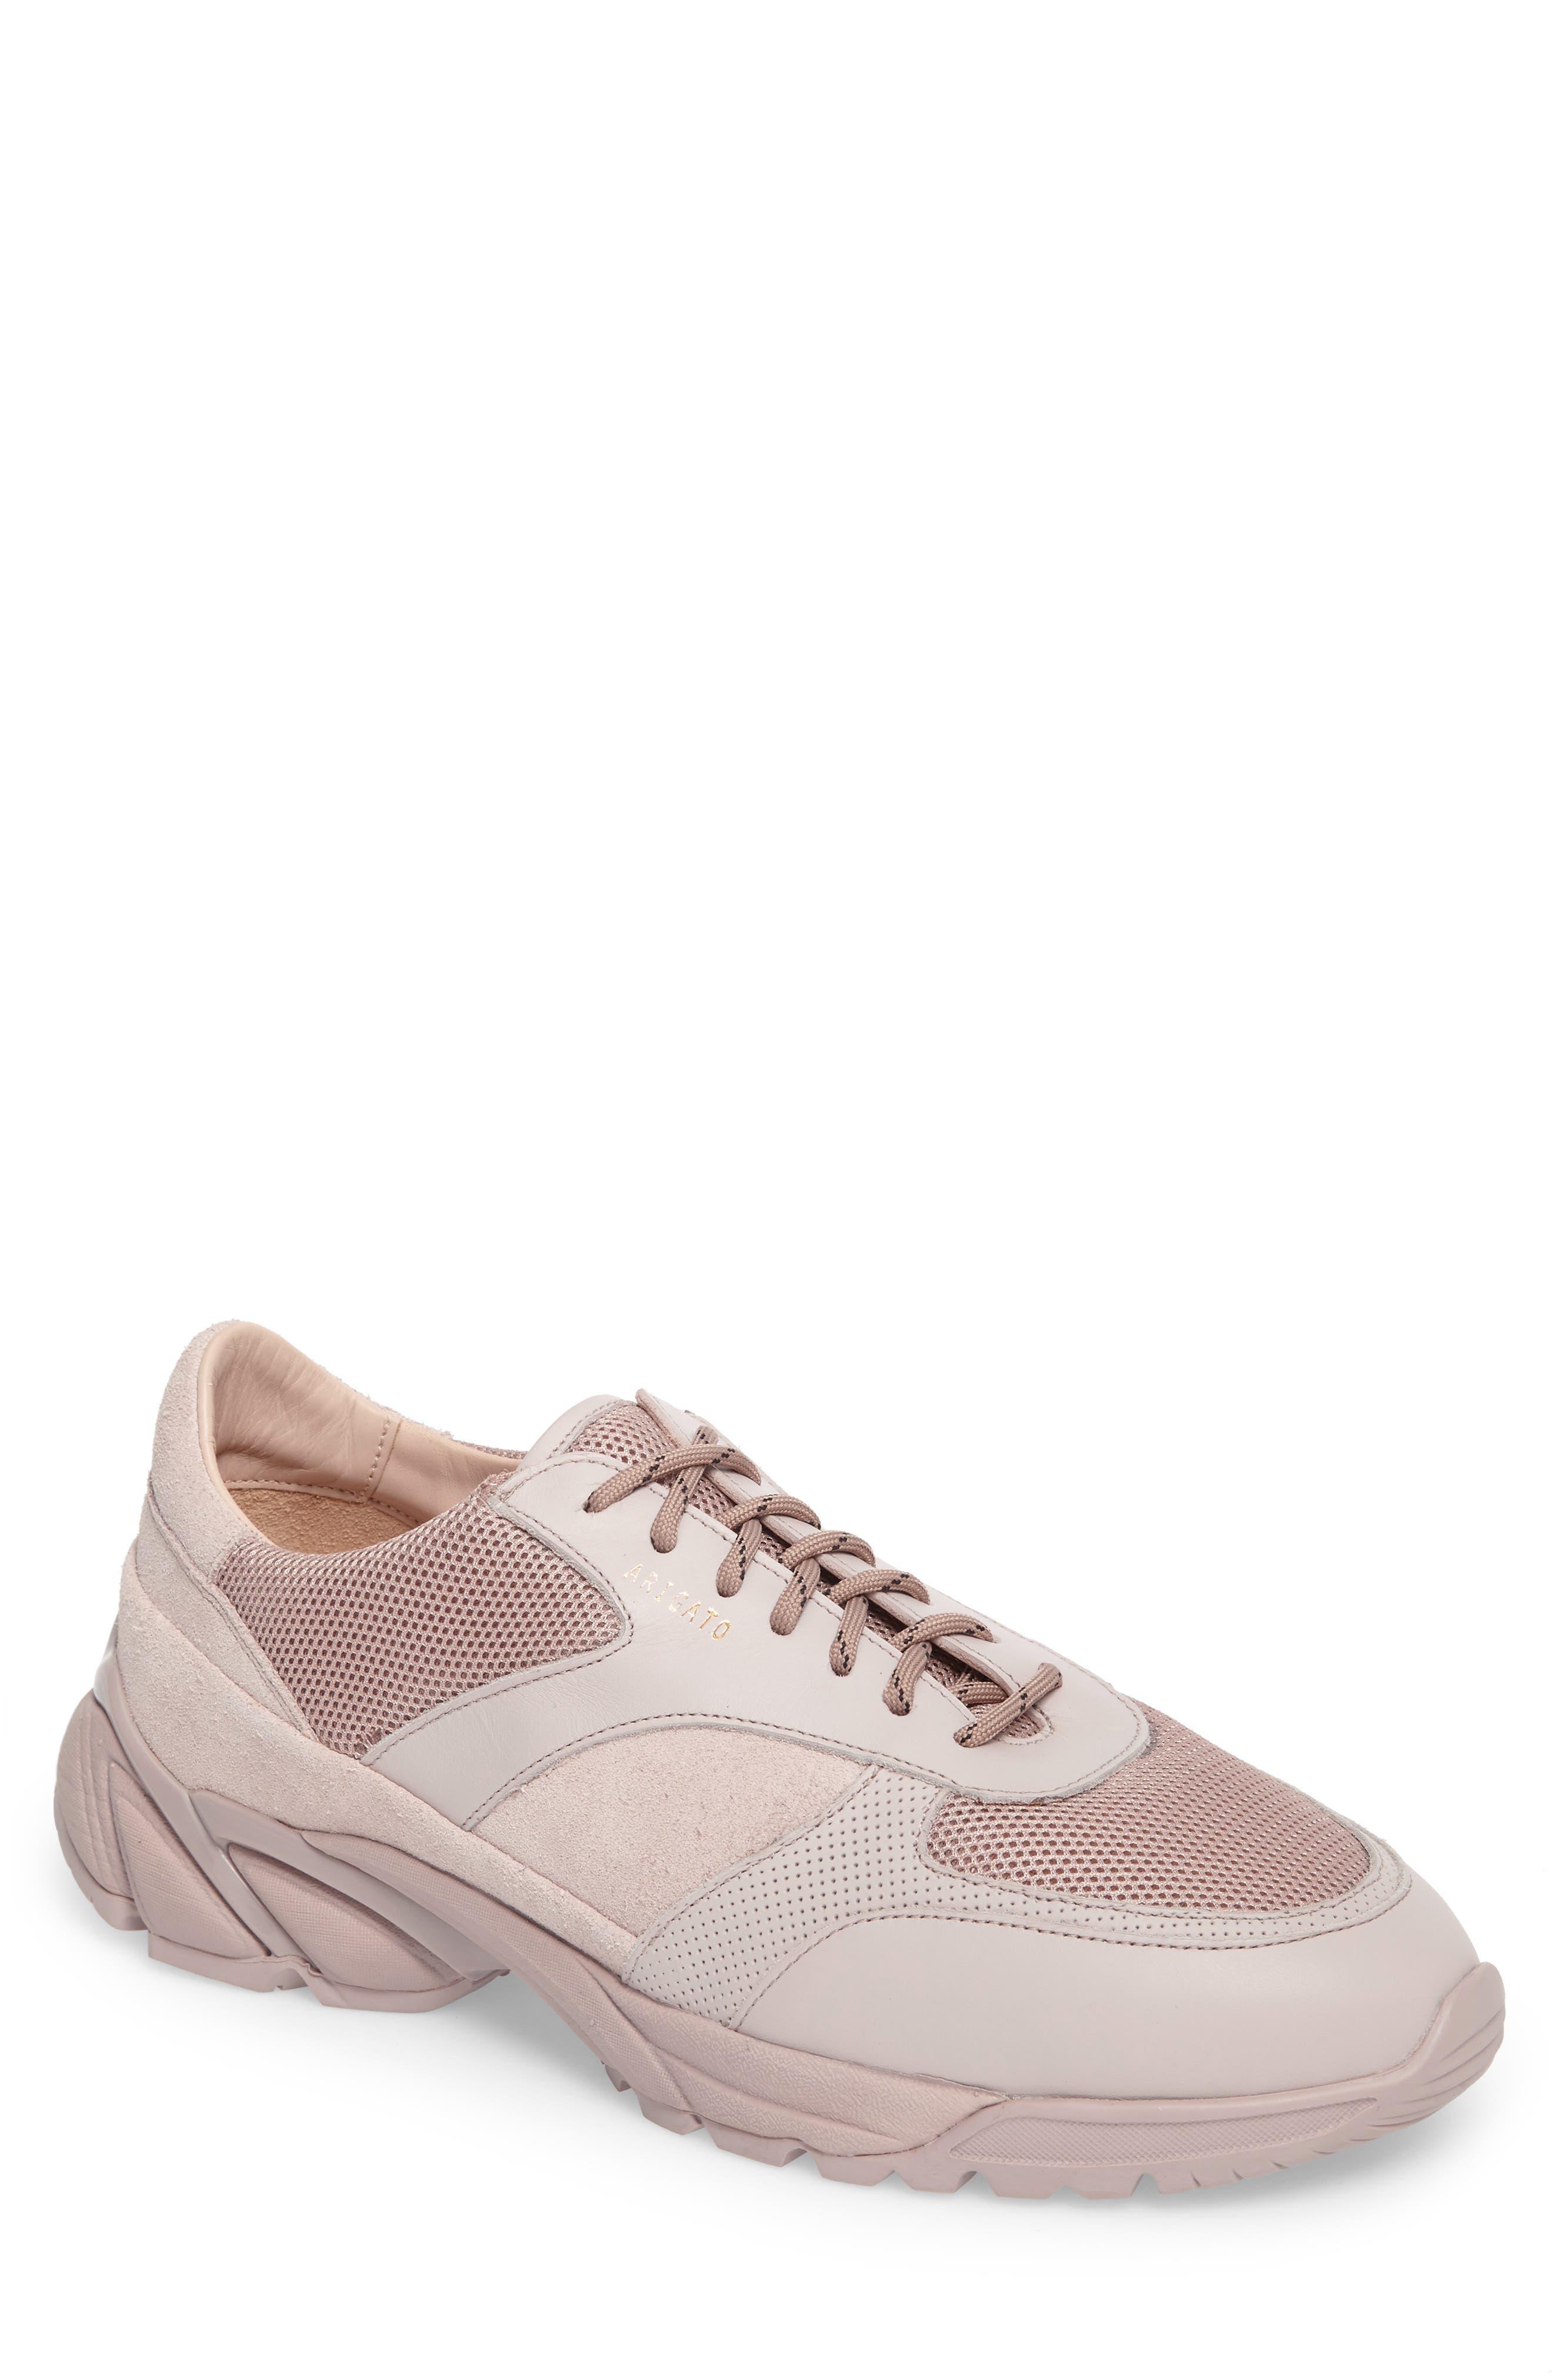 Tech Sneaker,                             Main thumbnail 1, color,                             Pale Lilac